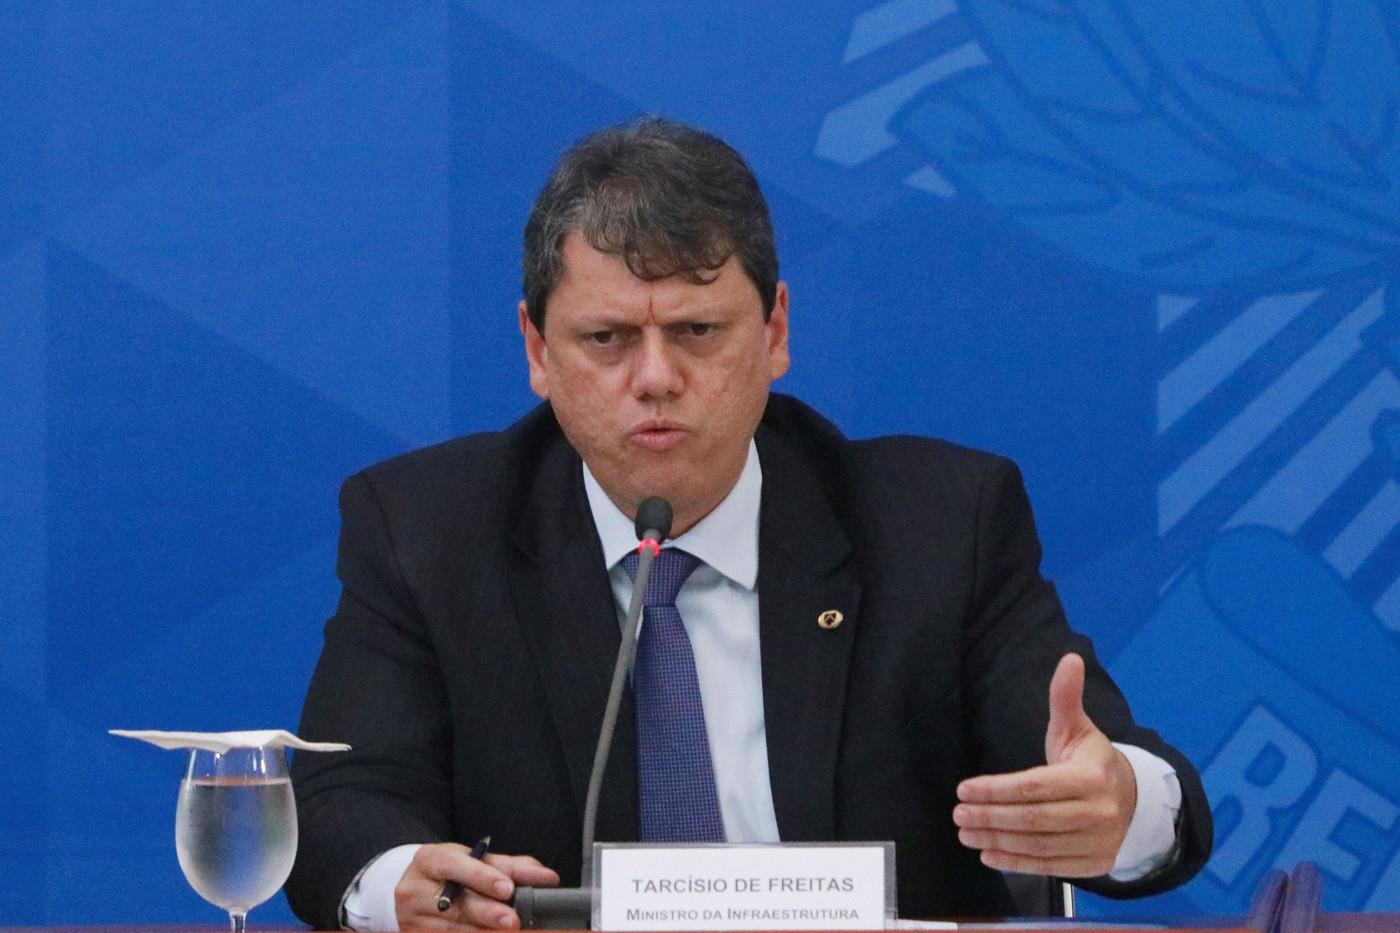 Tarcísio de Freitas é o atual ministro da Infraestrutura do Brasil